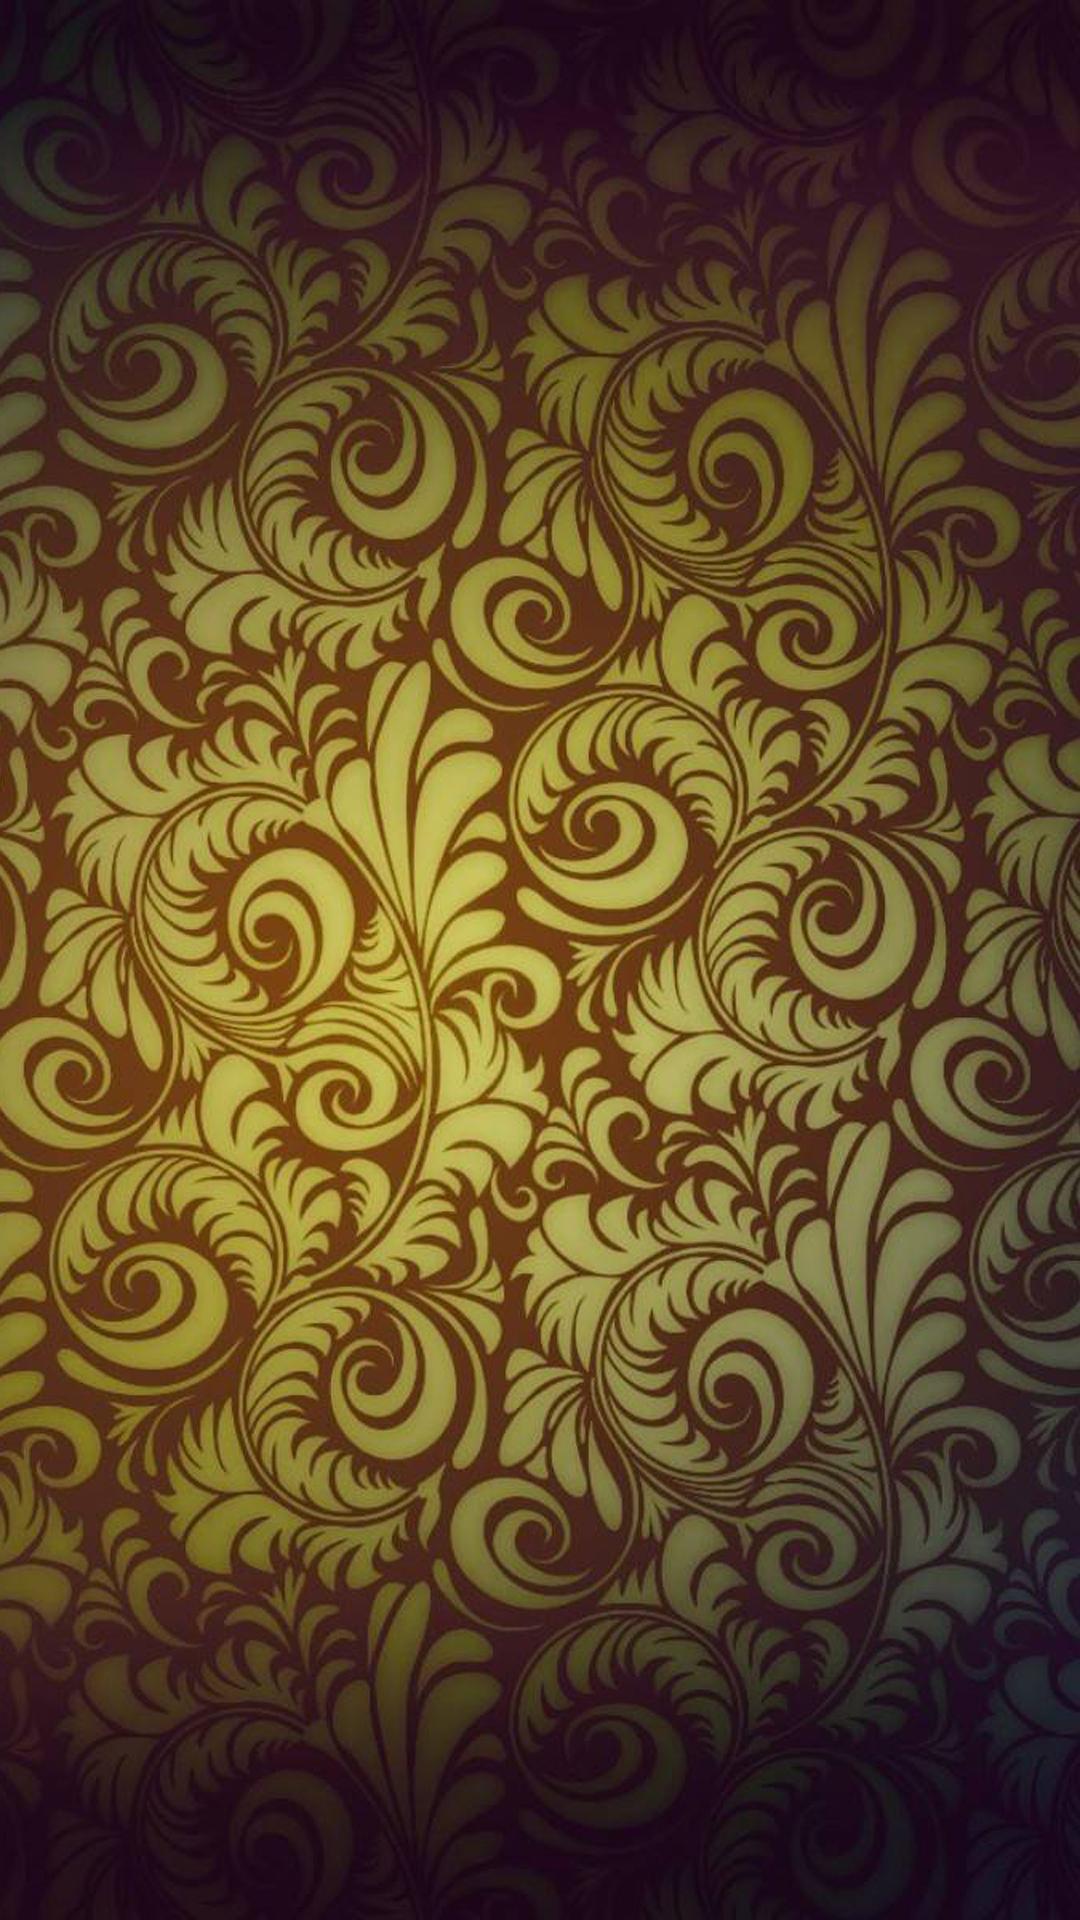 Texture Painting Wallpaper   123mobileWallpaperscom 1080x1920